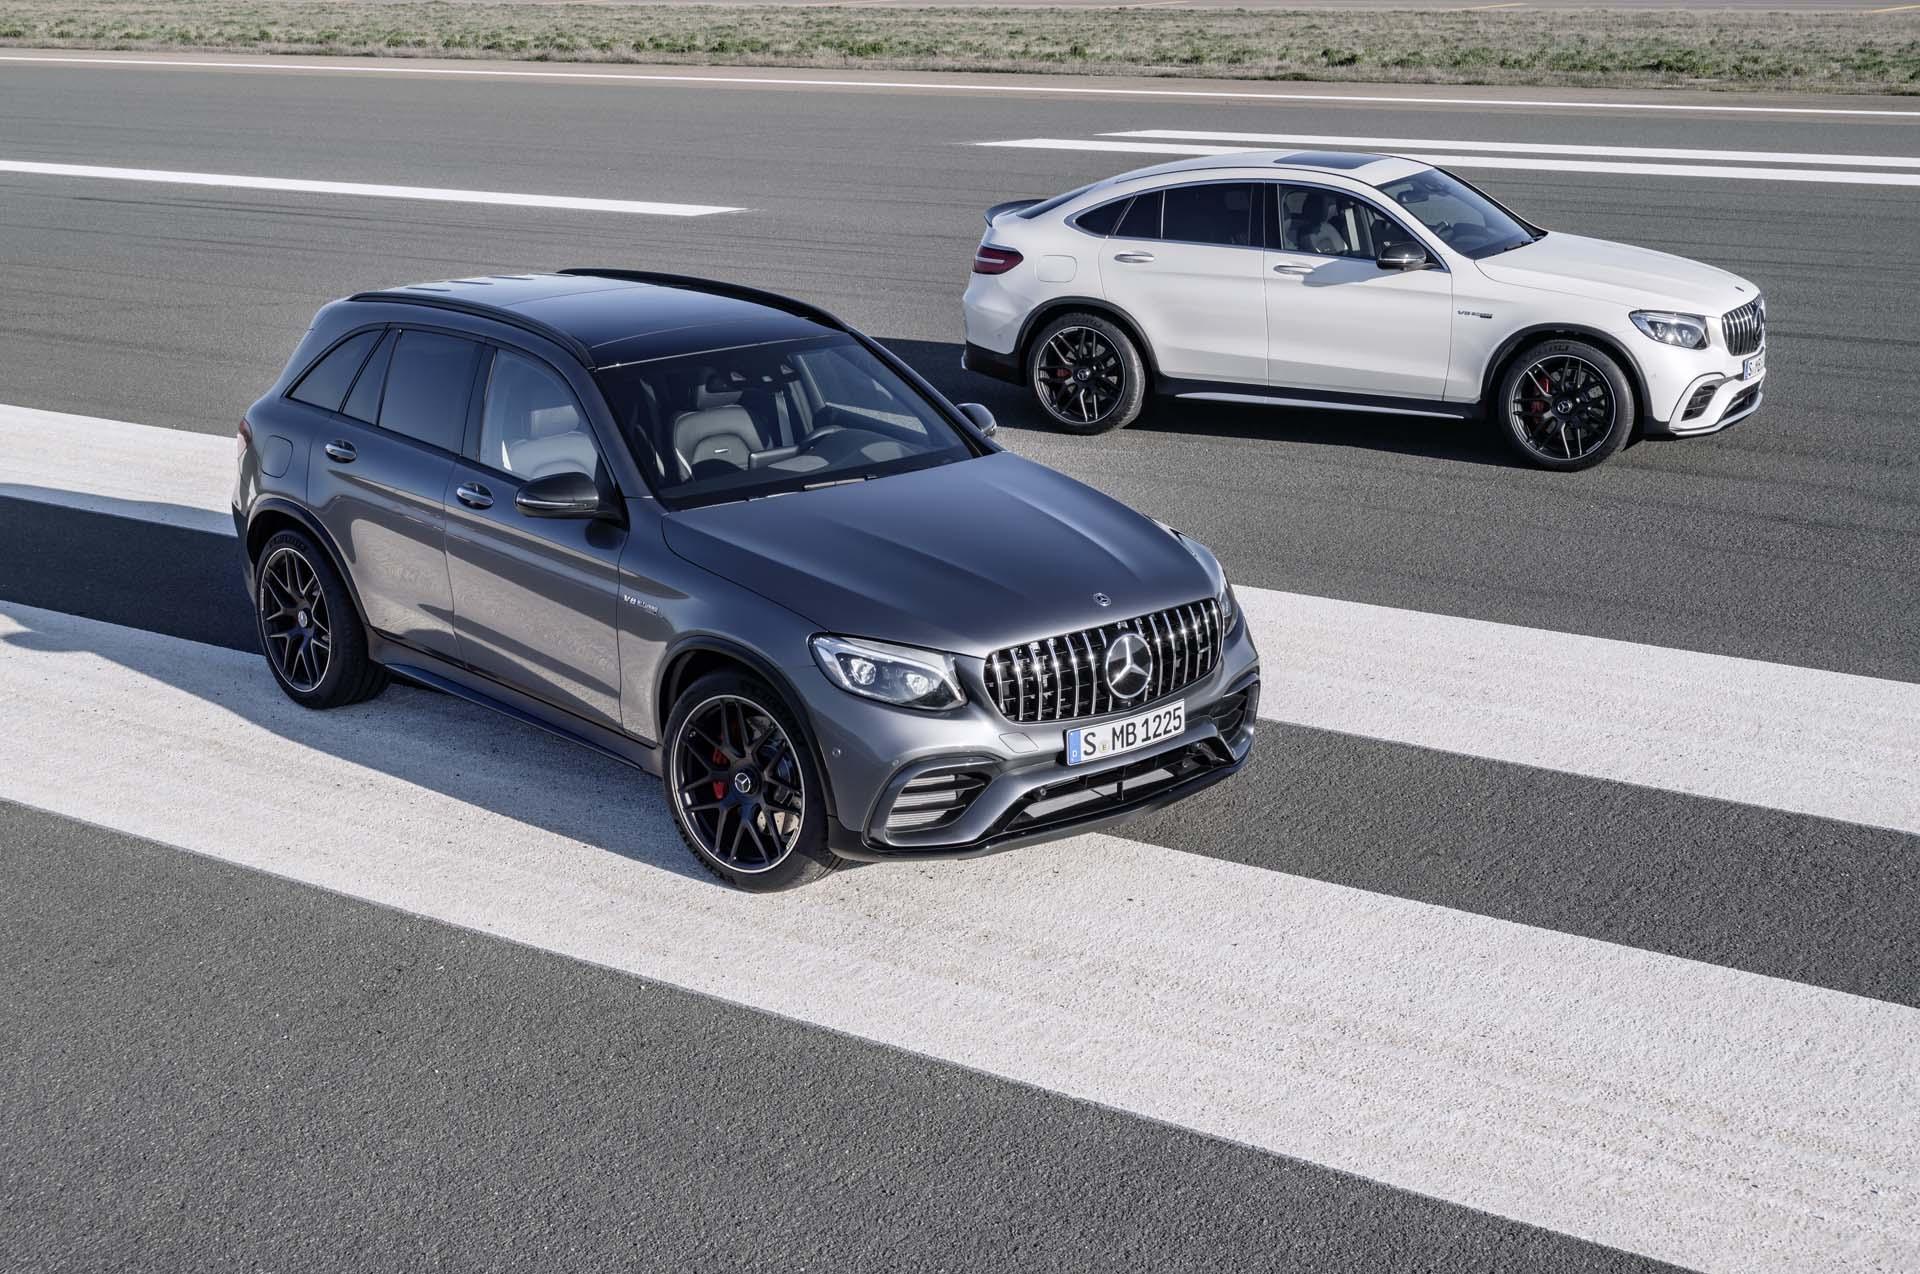 2018 Mercedesbenz Glc Class Review, Ratings, Specs